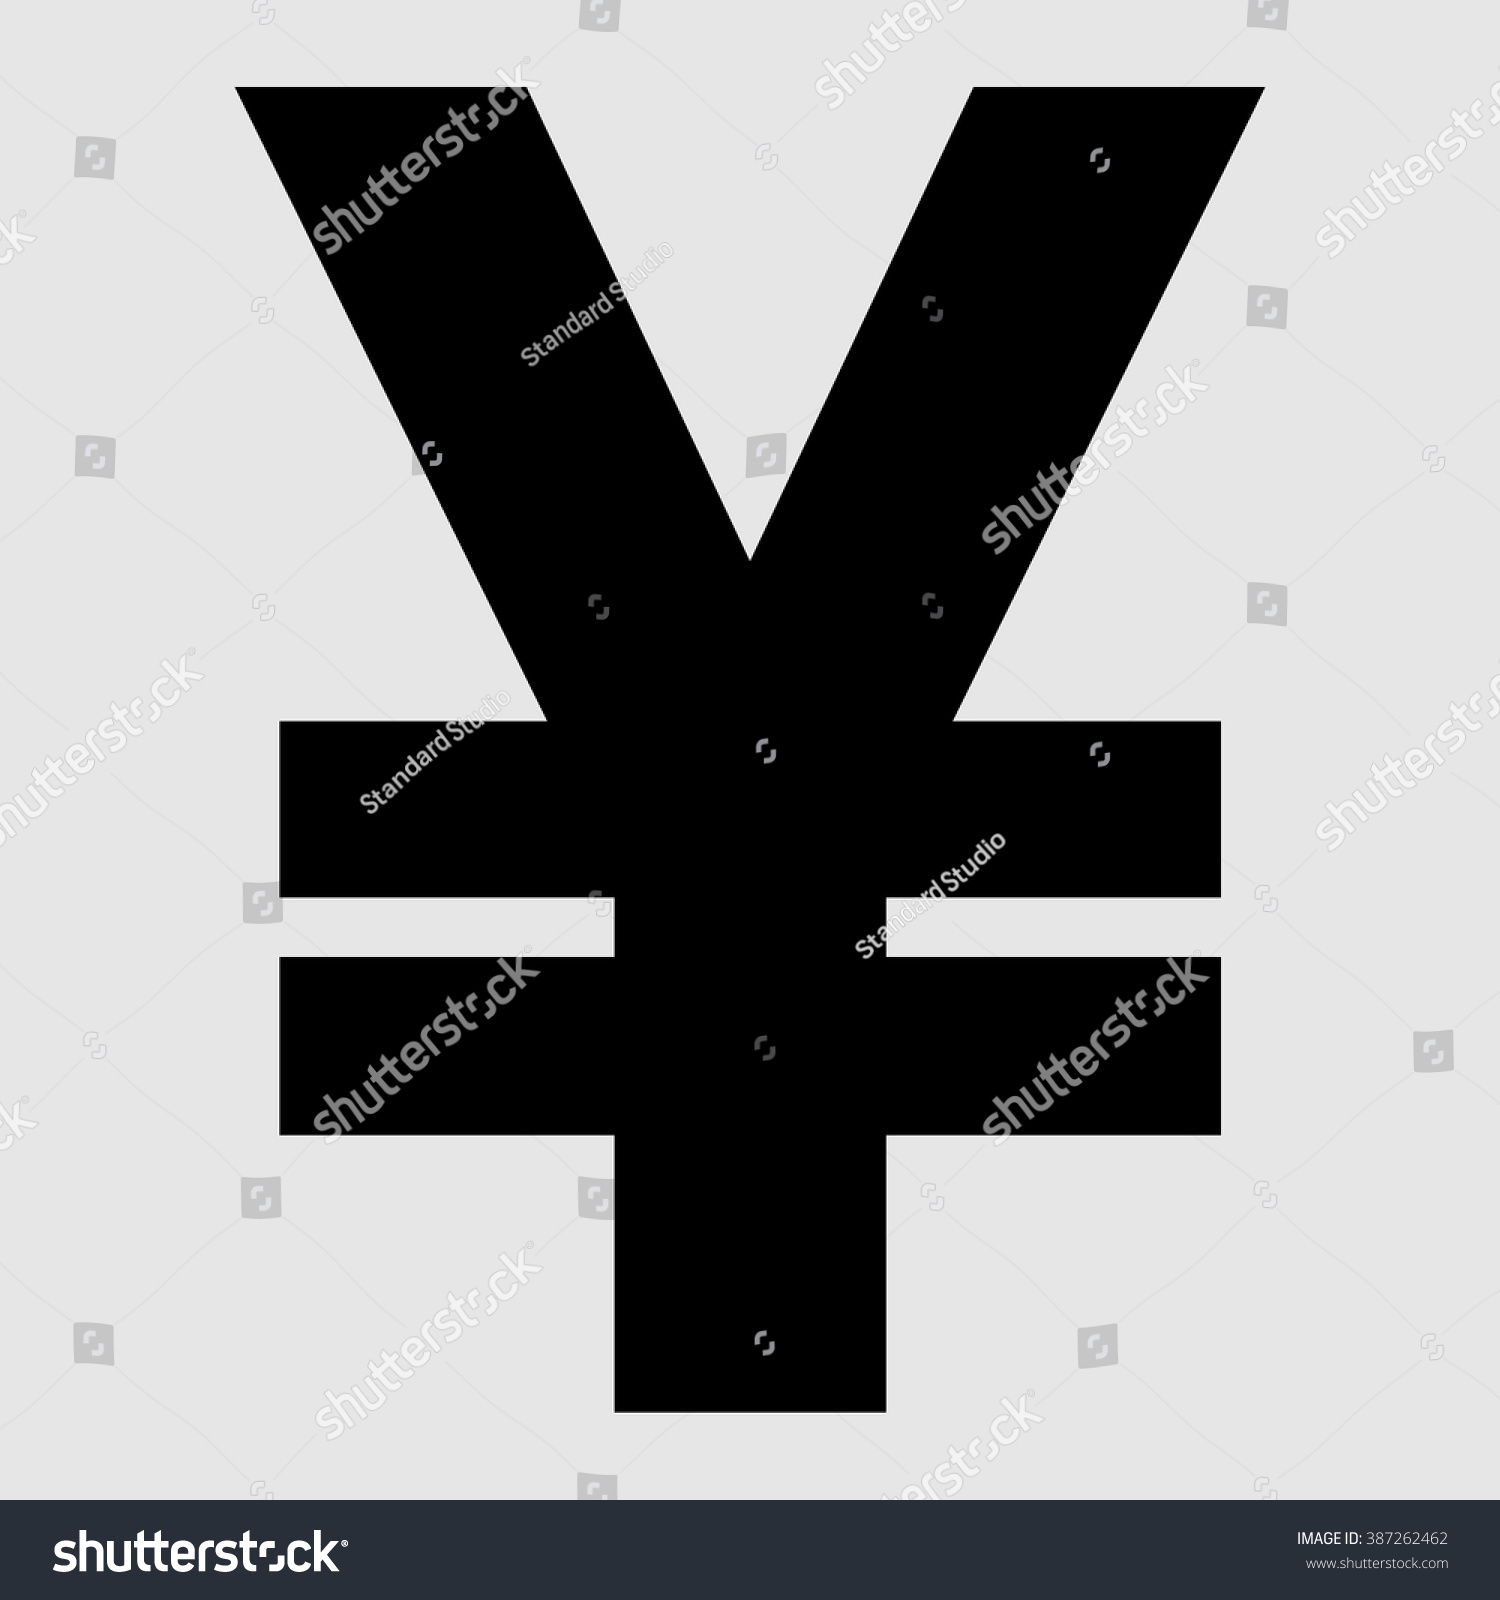 Chinese yuan icon cny currency symbol stock vector 387262462 chinese yuan icon cny currency symbol vector illustration buycottarizona Gallery